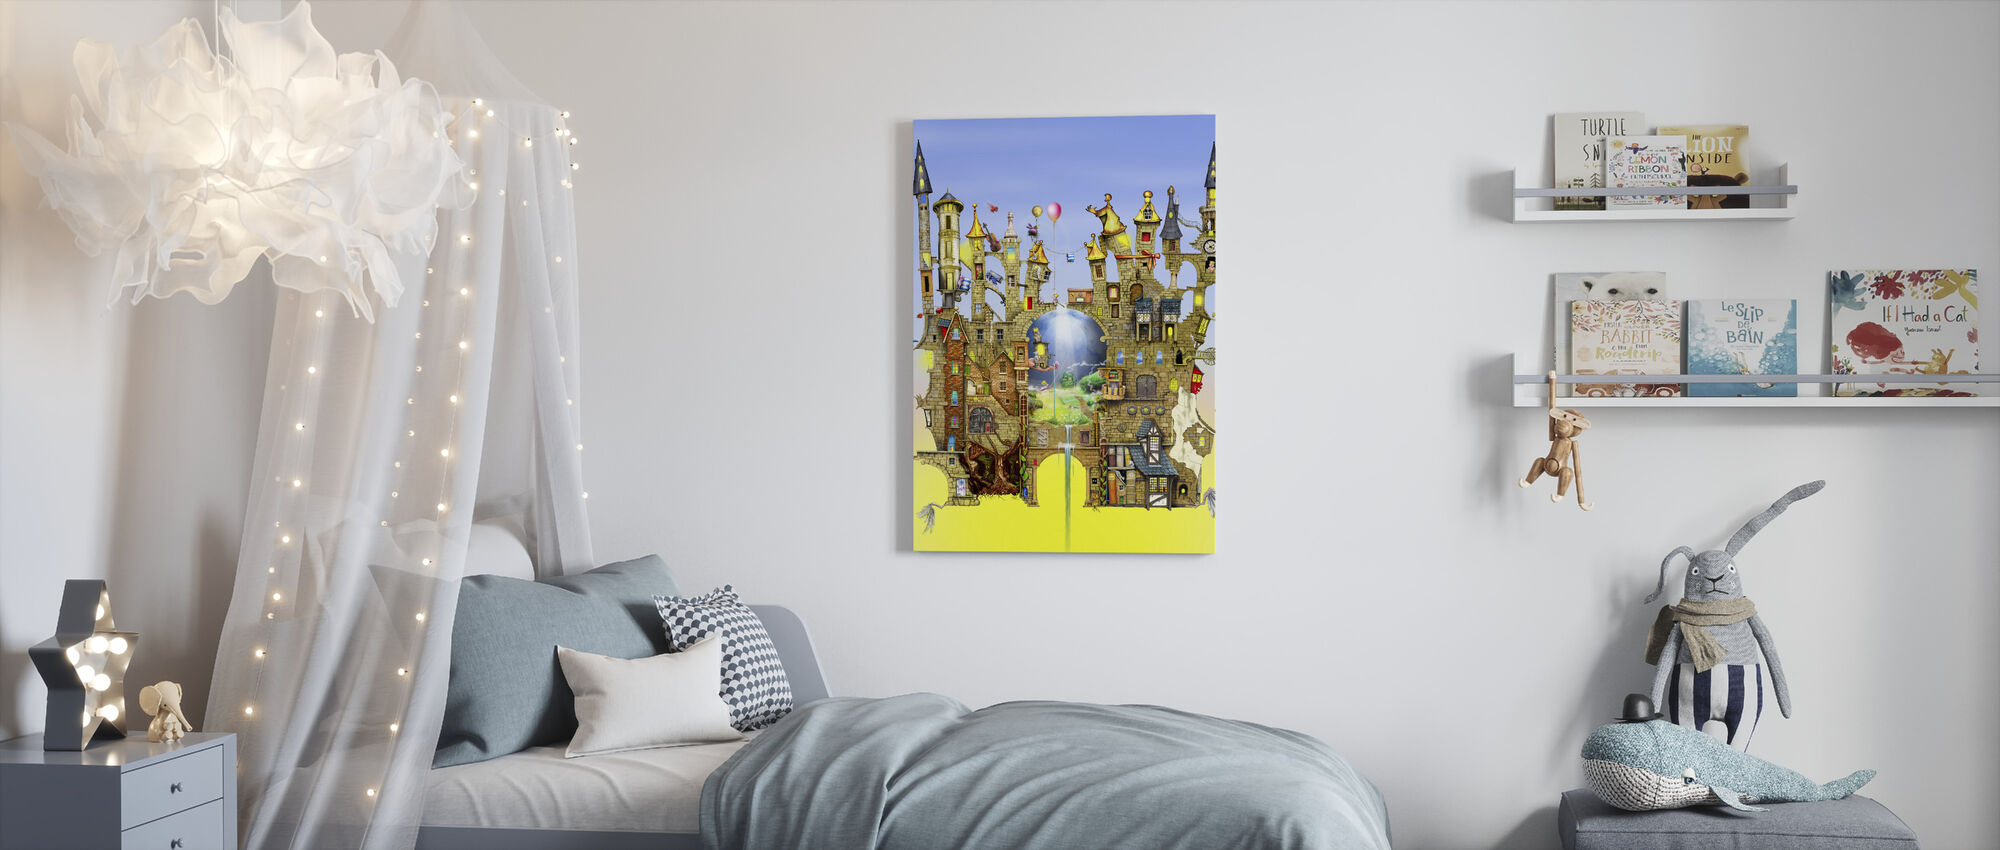 Slott i luften - Canvastavla - Barnrum